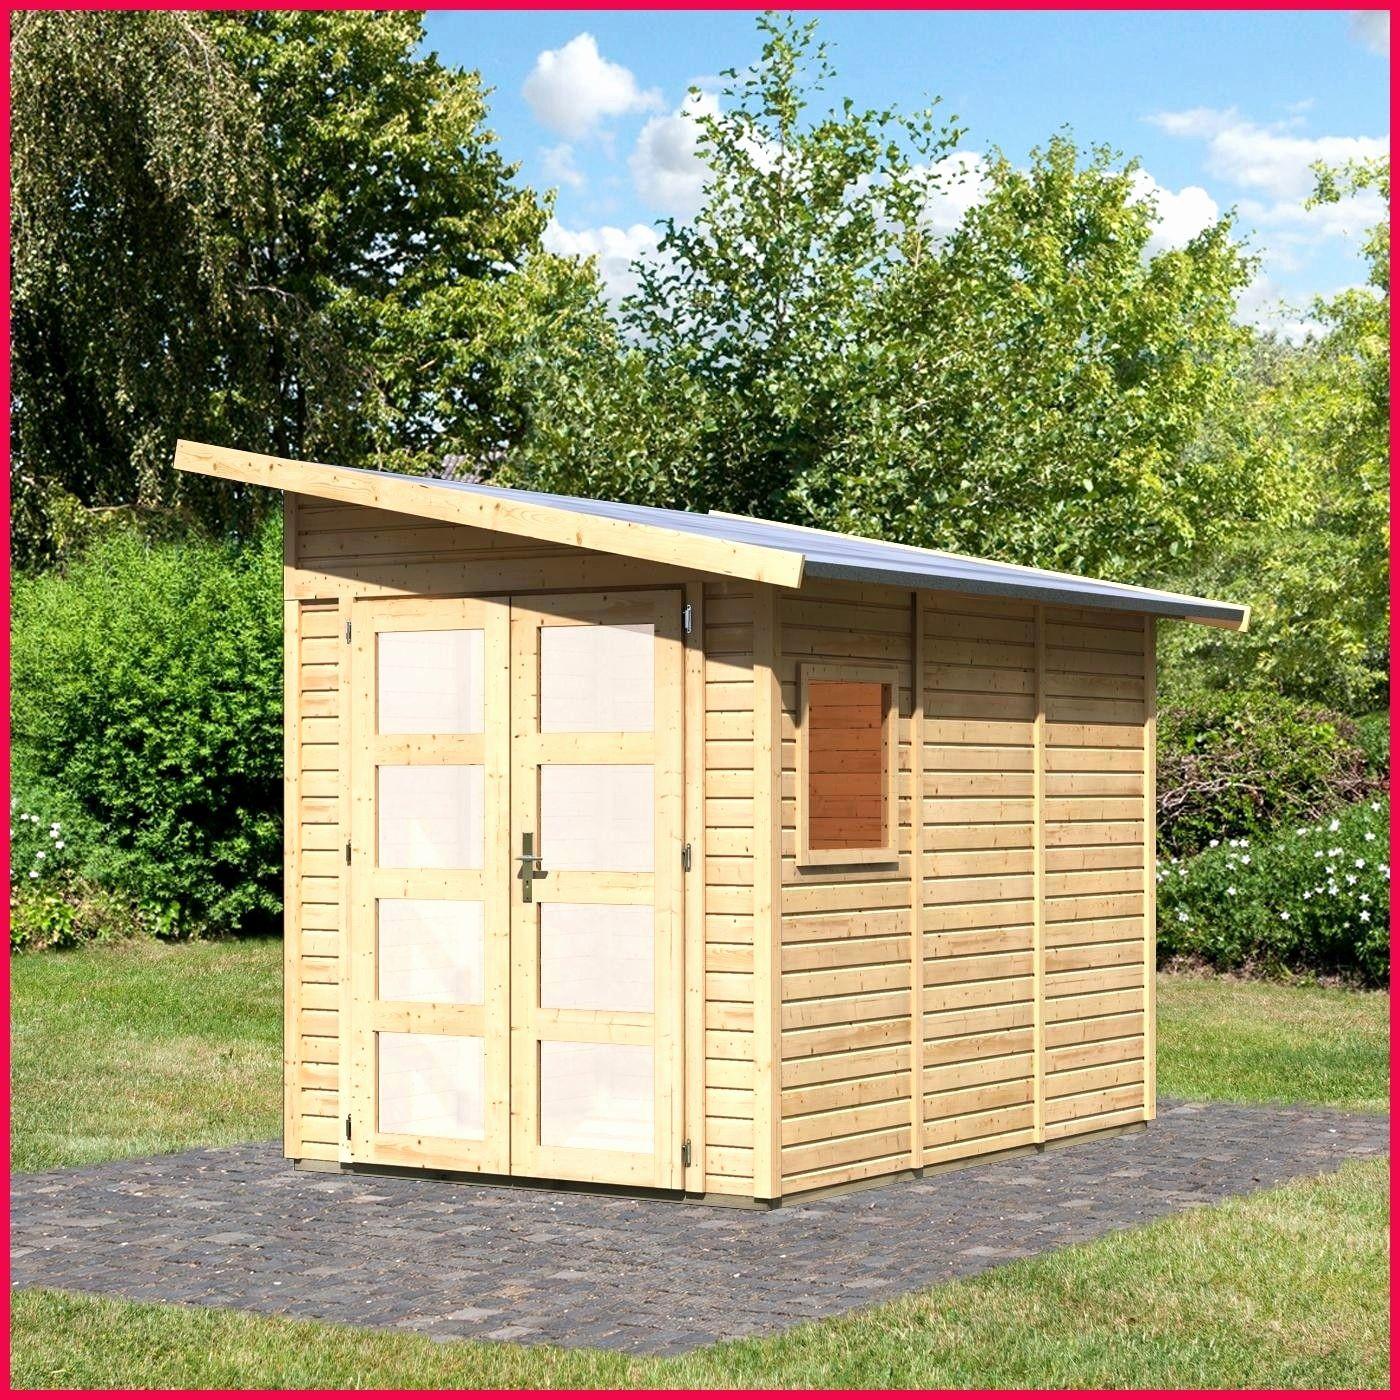 abri de jardin bois bri arche abri moto jardin graux de terrasse brico depot finest beau pergola 1